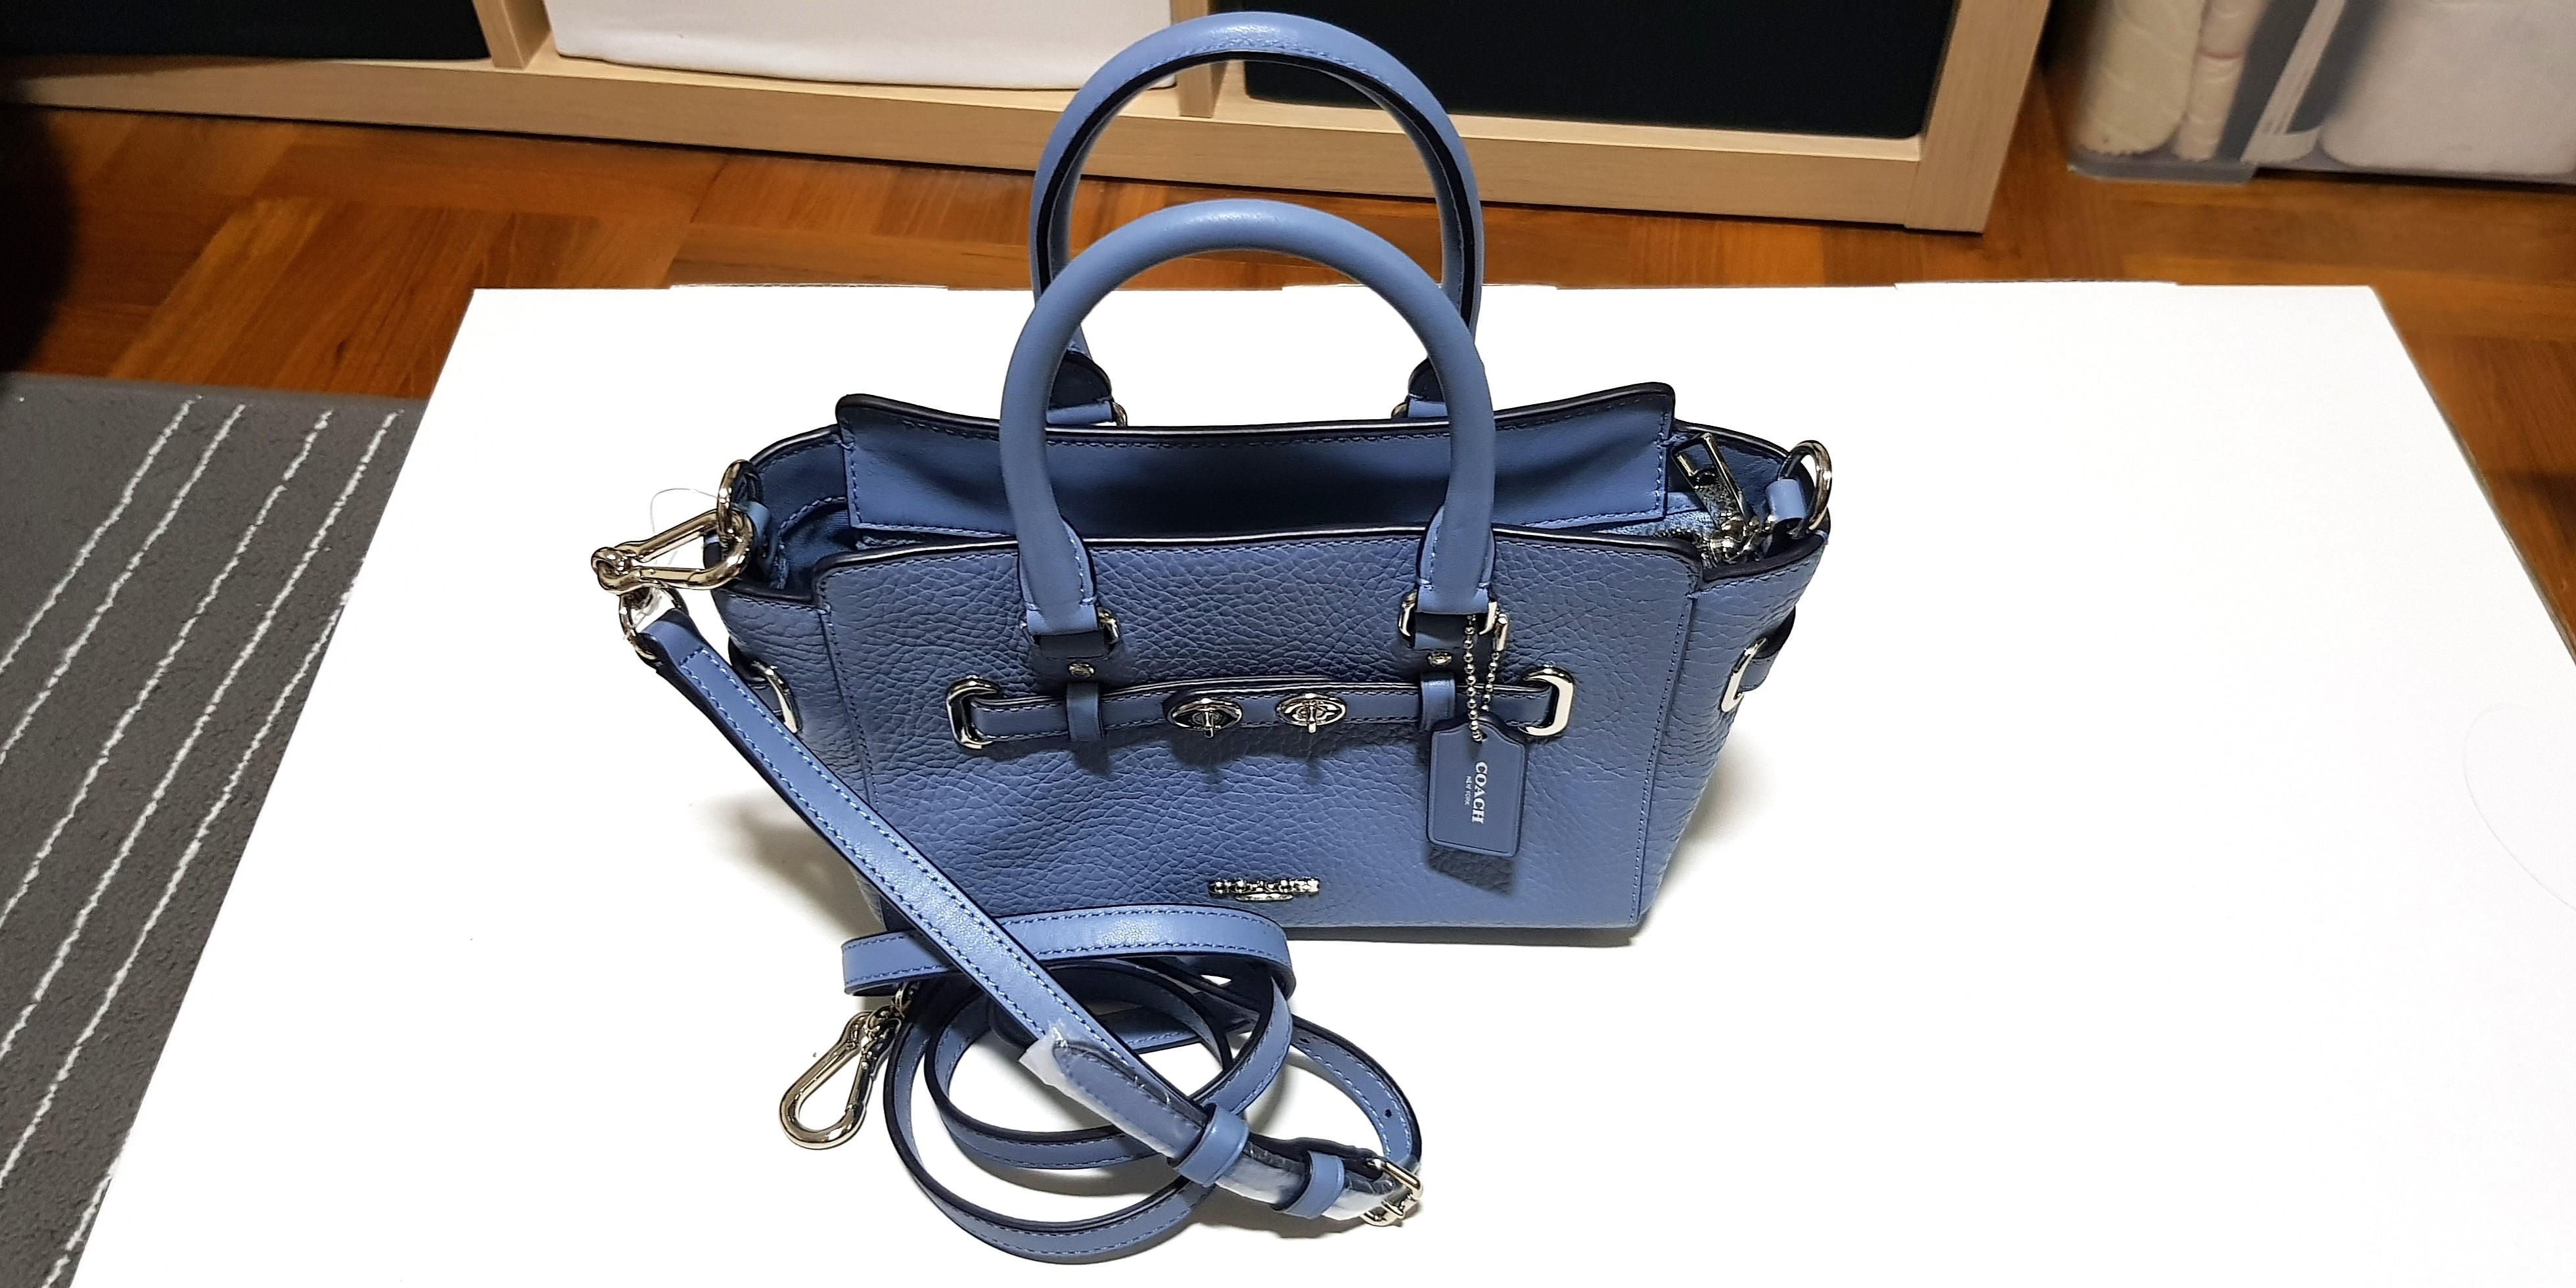 51a1bb62dbc Coach Blake crossbody bag, Luxury, Bags & Wallets, Sling Bags on Carousell